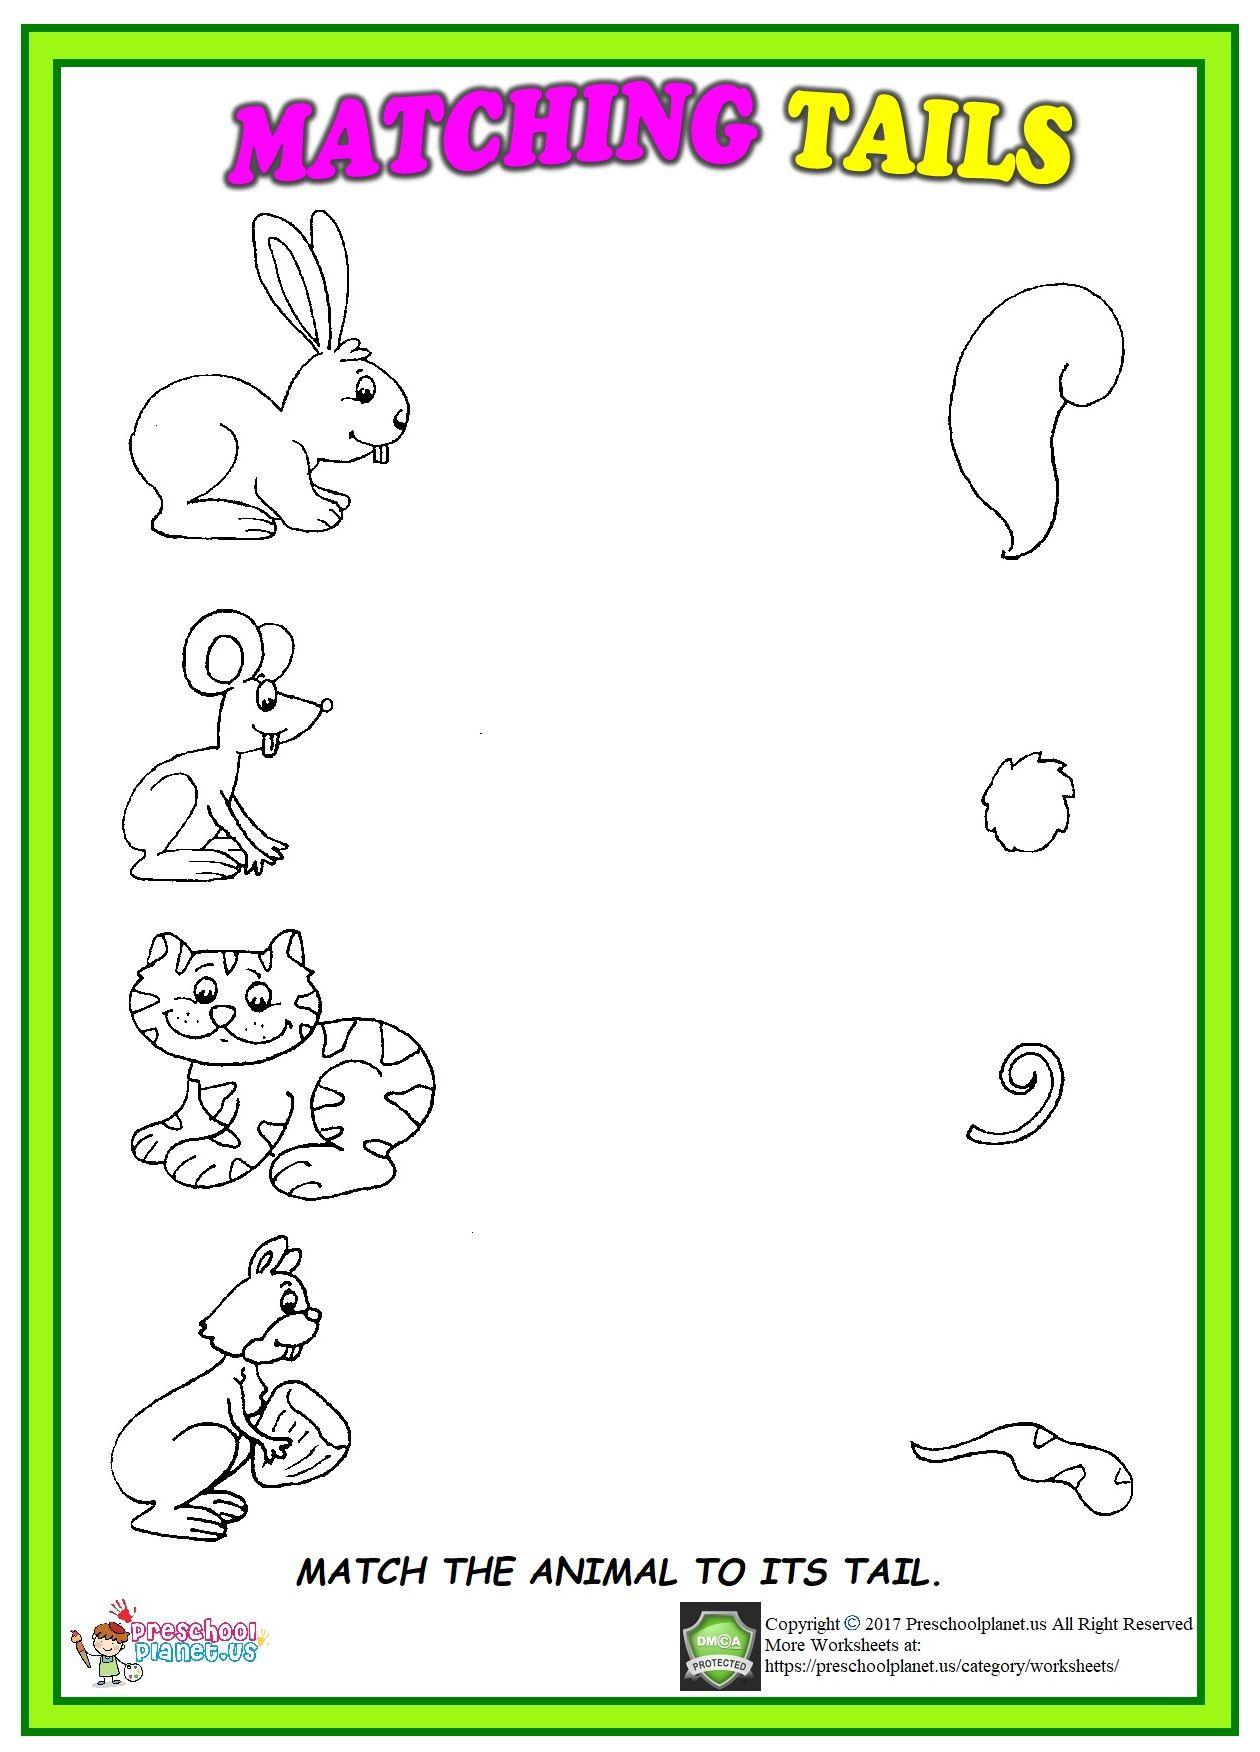 animal tails matching worksheet coloring activities matching worksheets animal tails. Black Bedroom Furniture Sets. Home Design Ideas